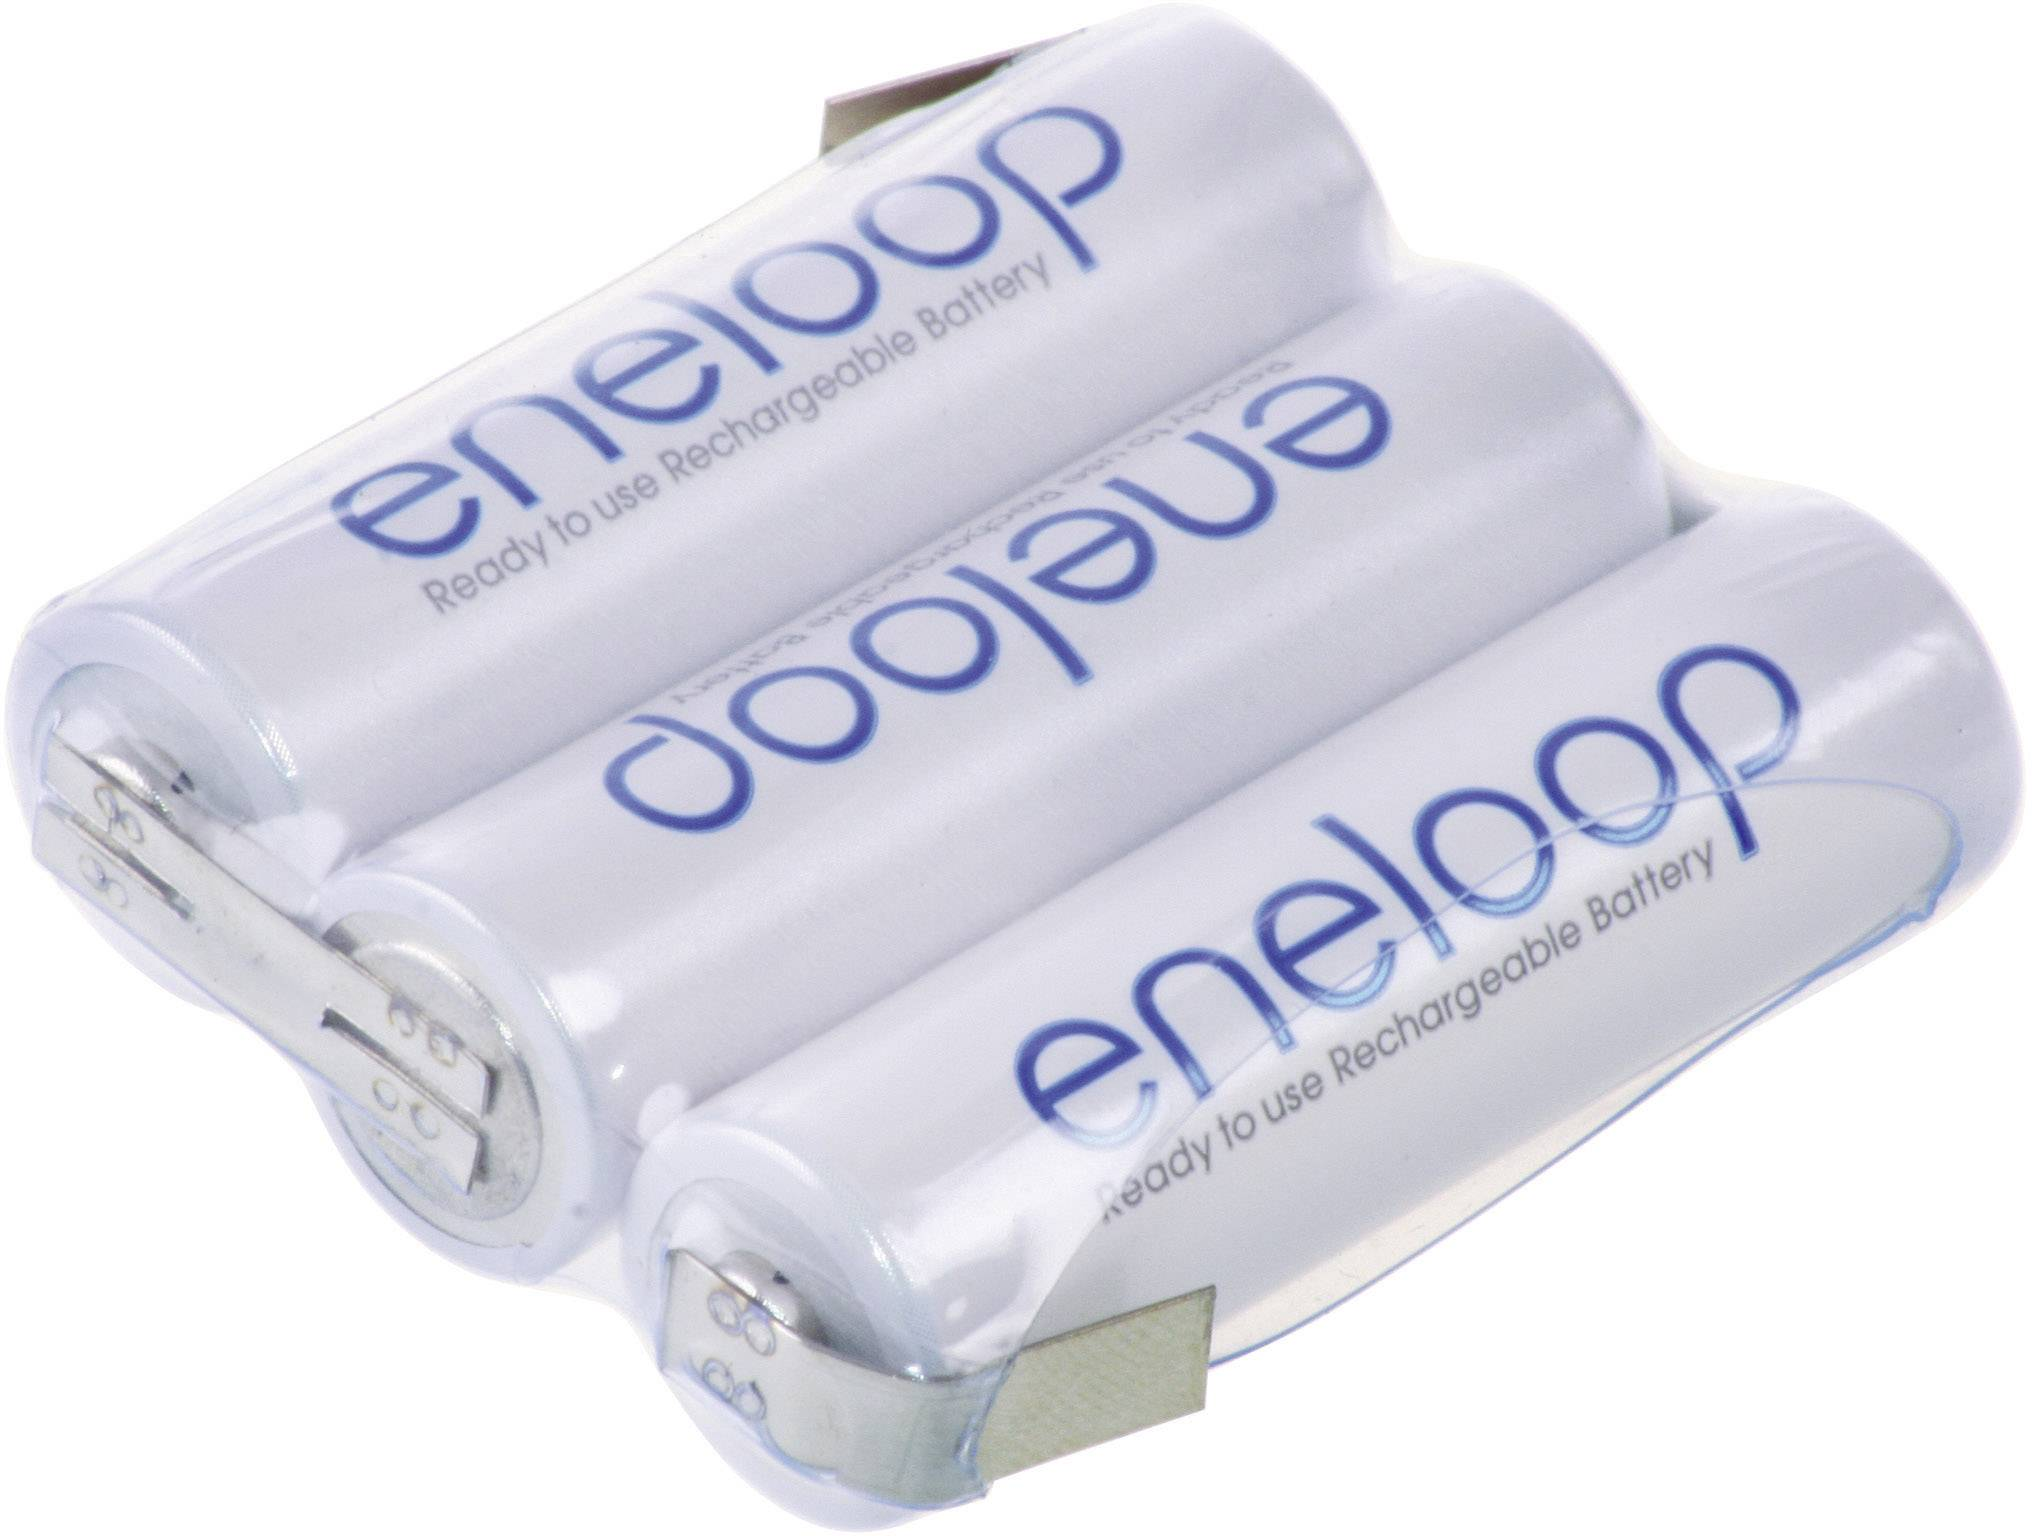 Akupack - sada nabíjacích batérií NiMH 3 mignon (AA) Panasonic eneloop Reihe F1x3 129673, 1900 mAh, 3.6 V